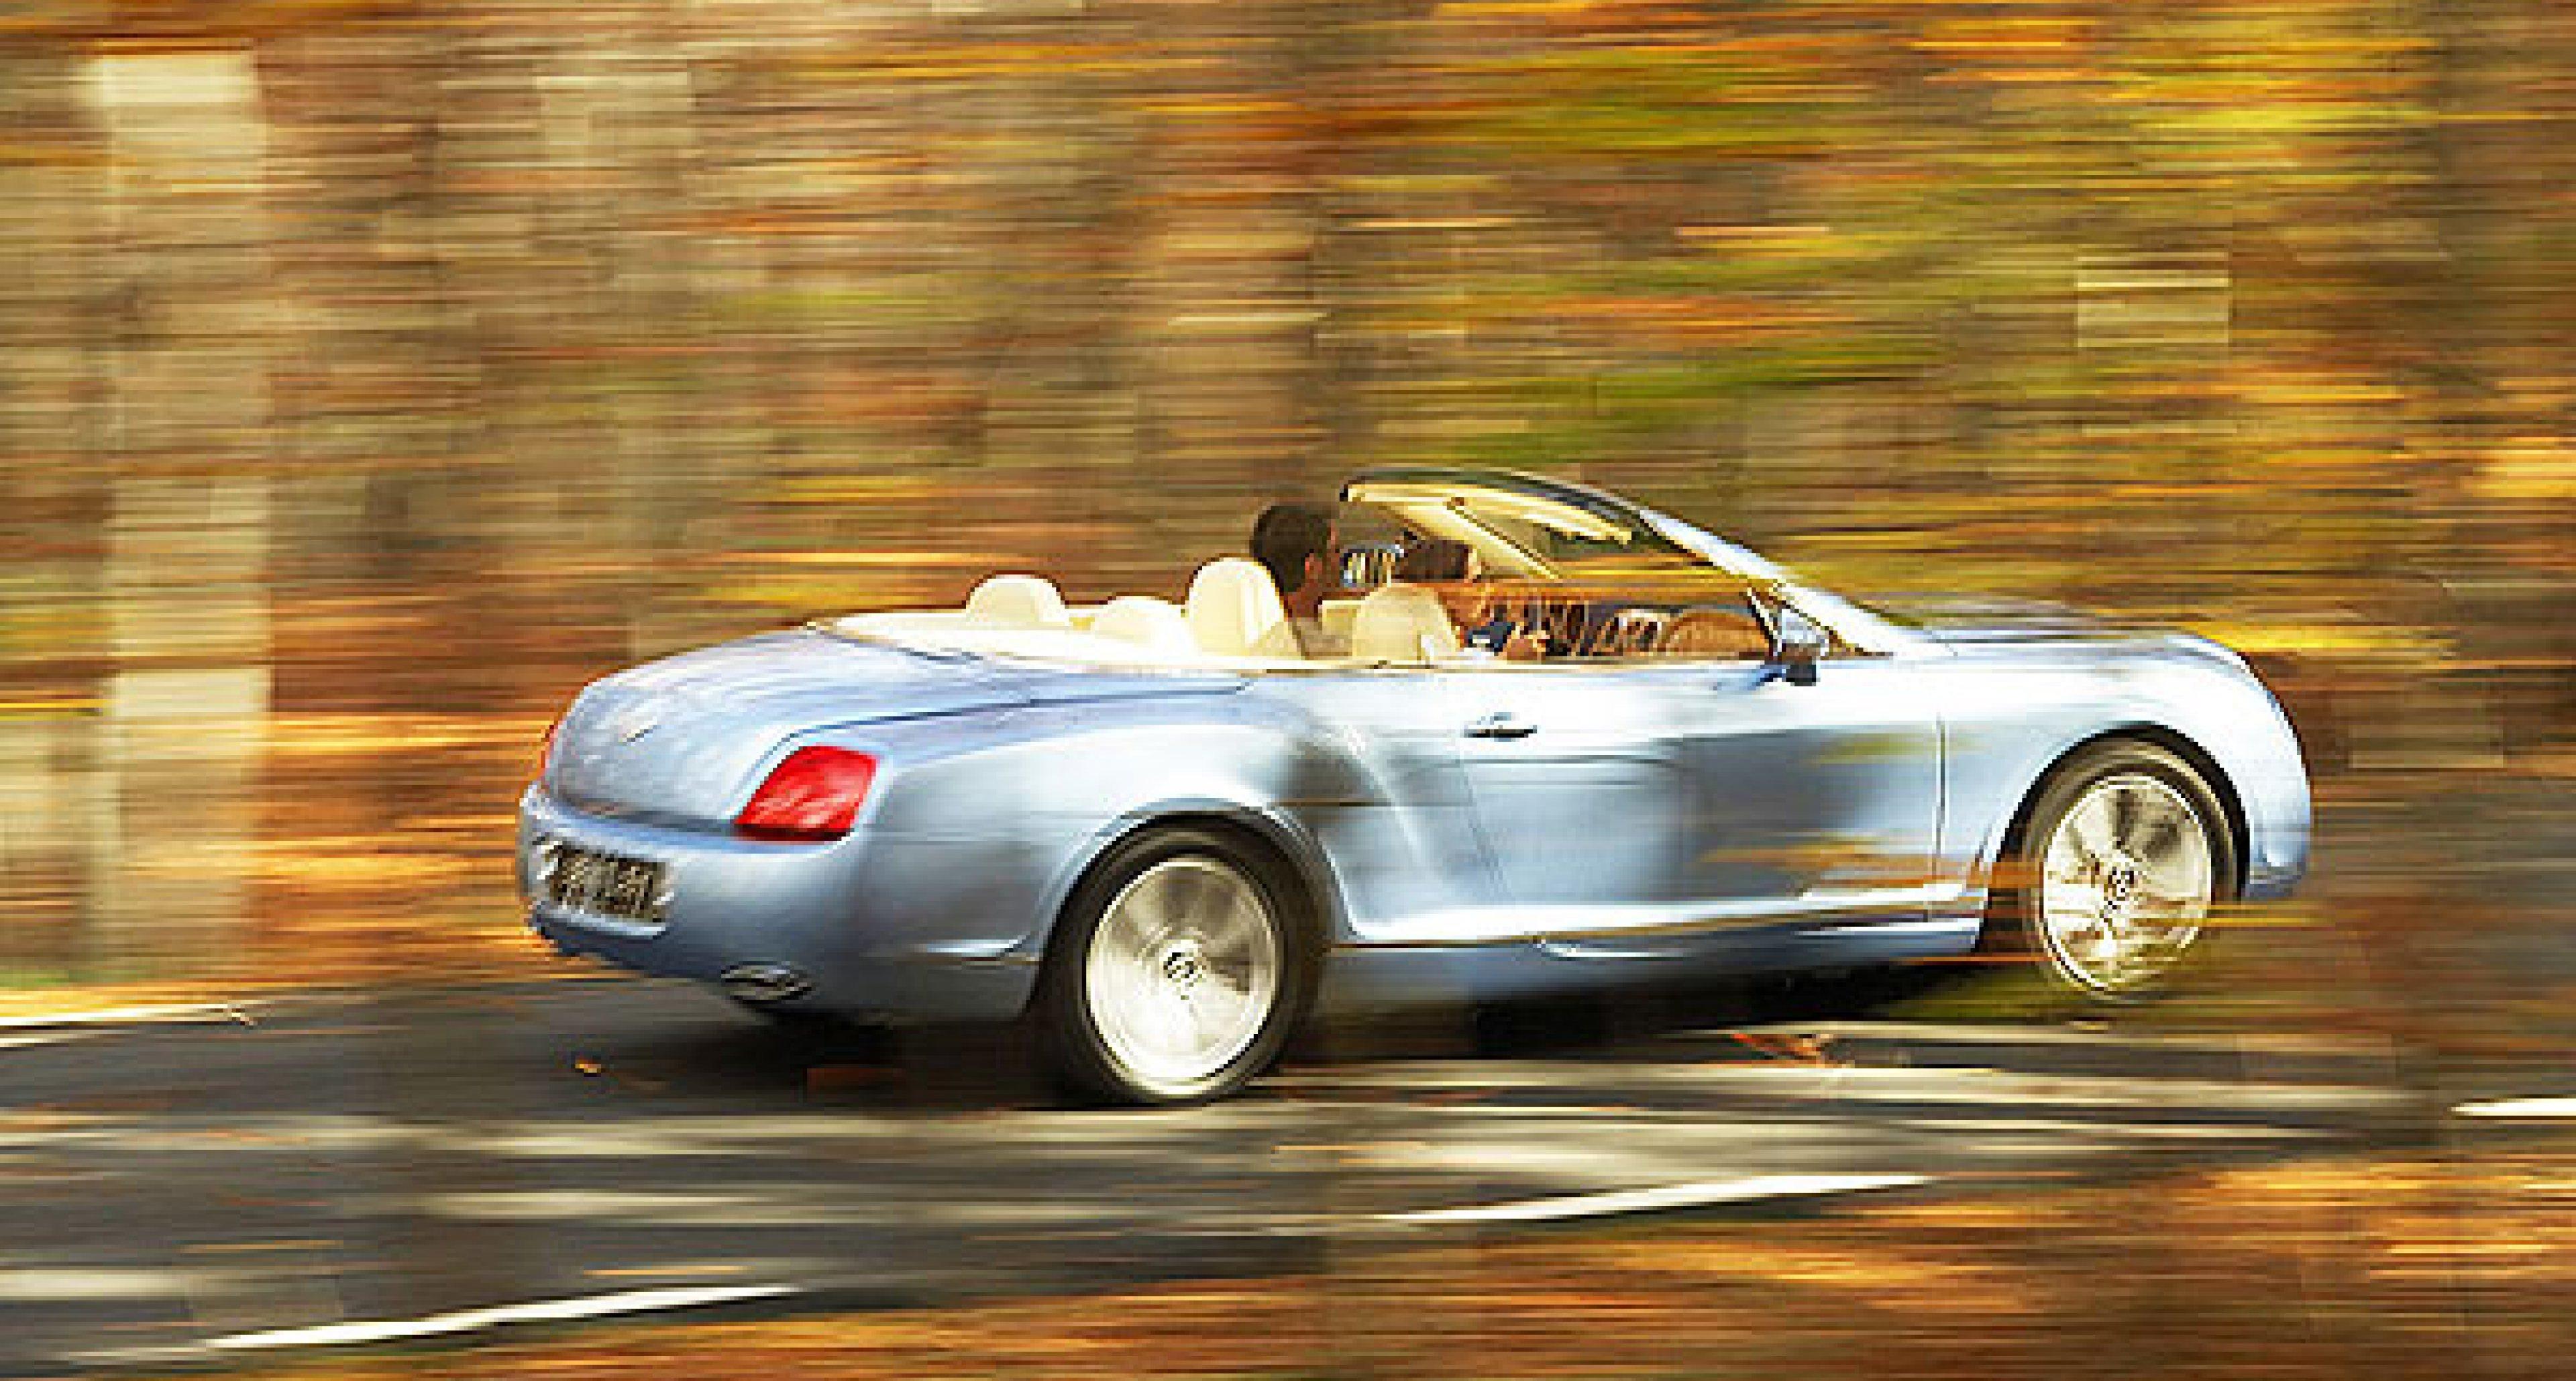 Bentley Continental GTC in New York